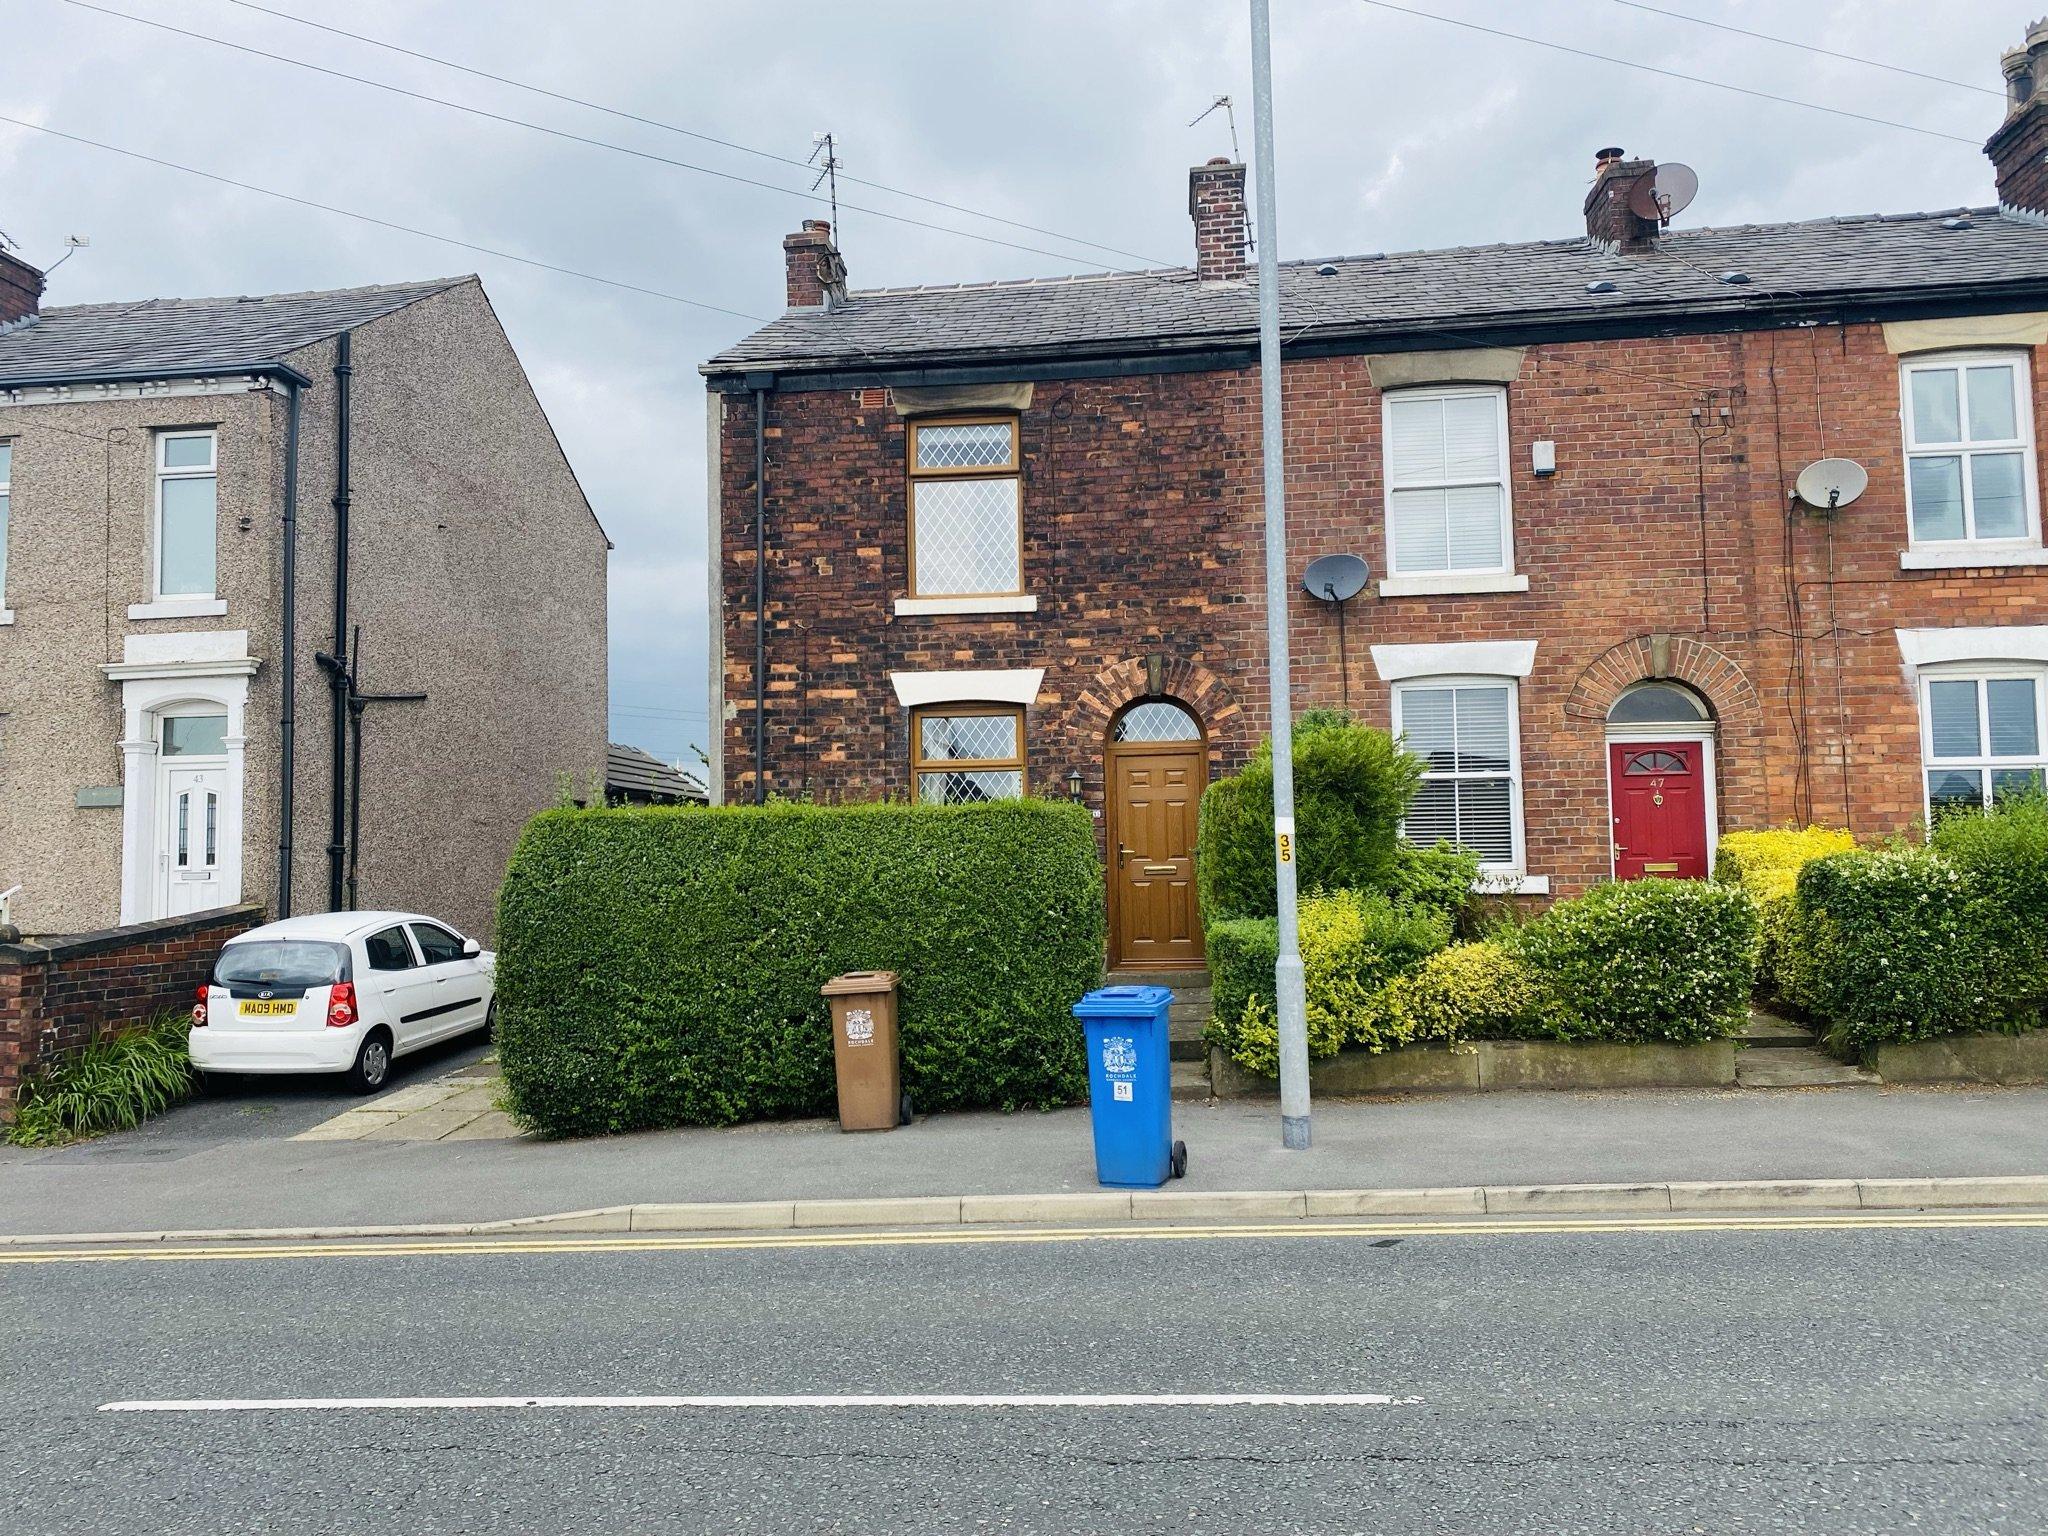 Norden Road, Bamford, Rochdale OL11 5PN